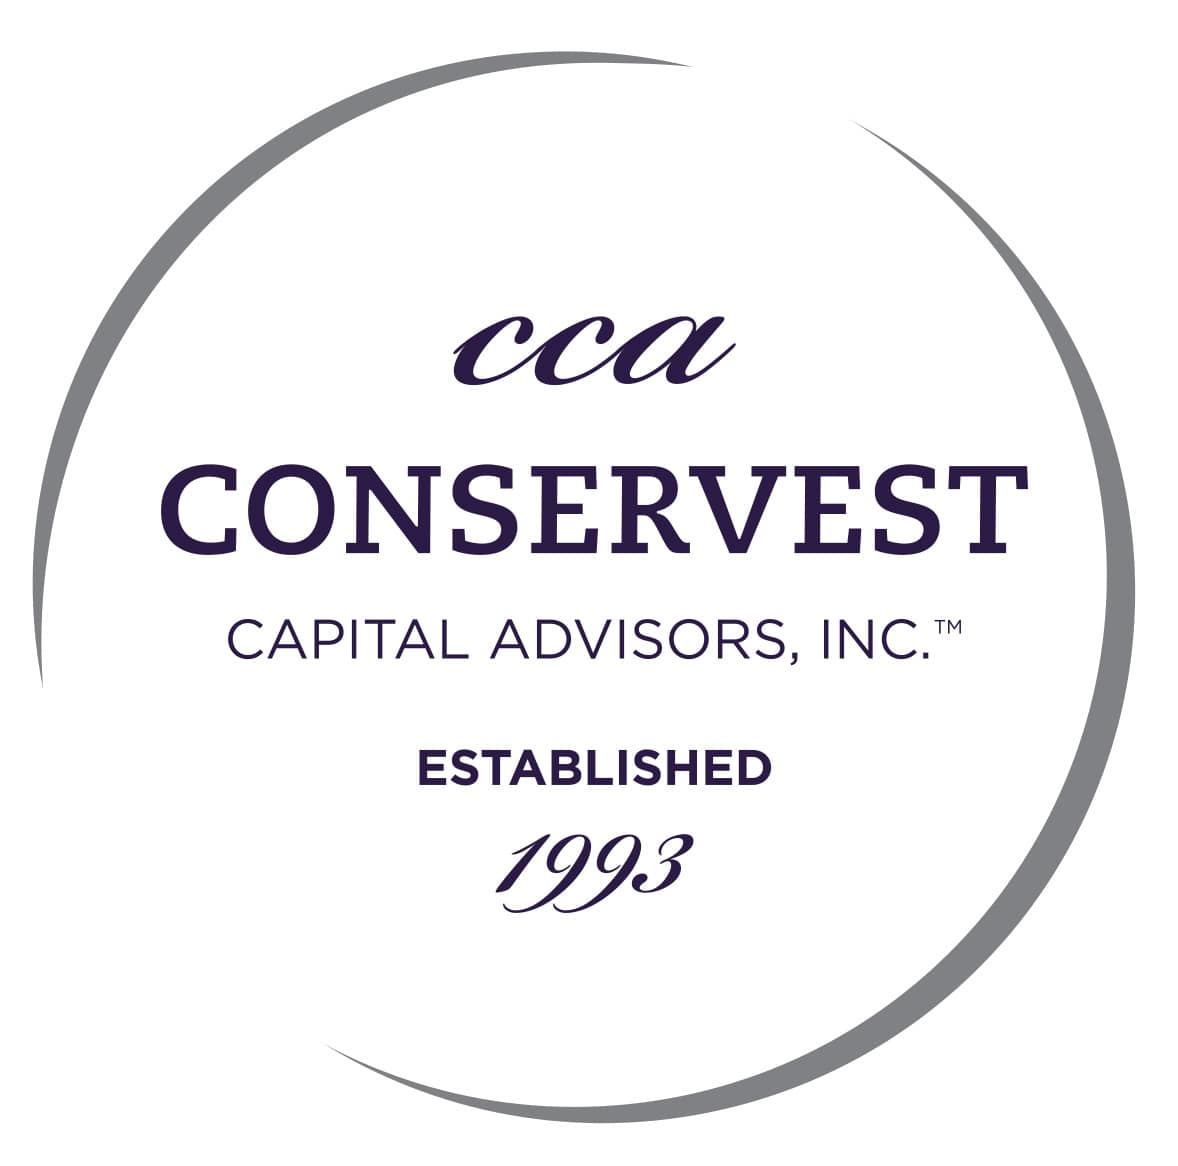 Conservest anniversary logo NEW 2-min